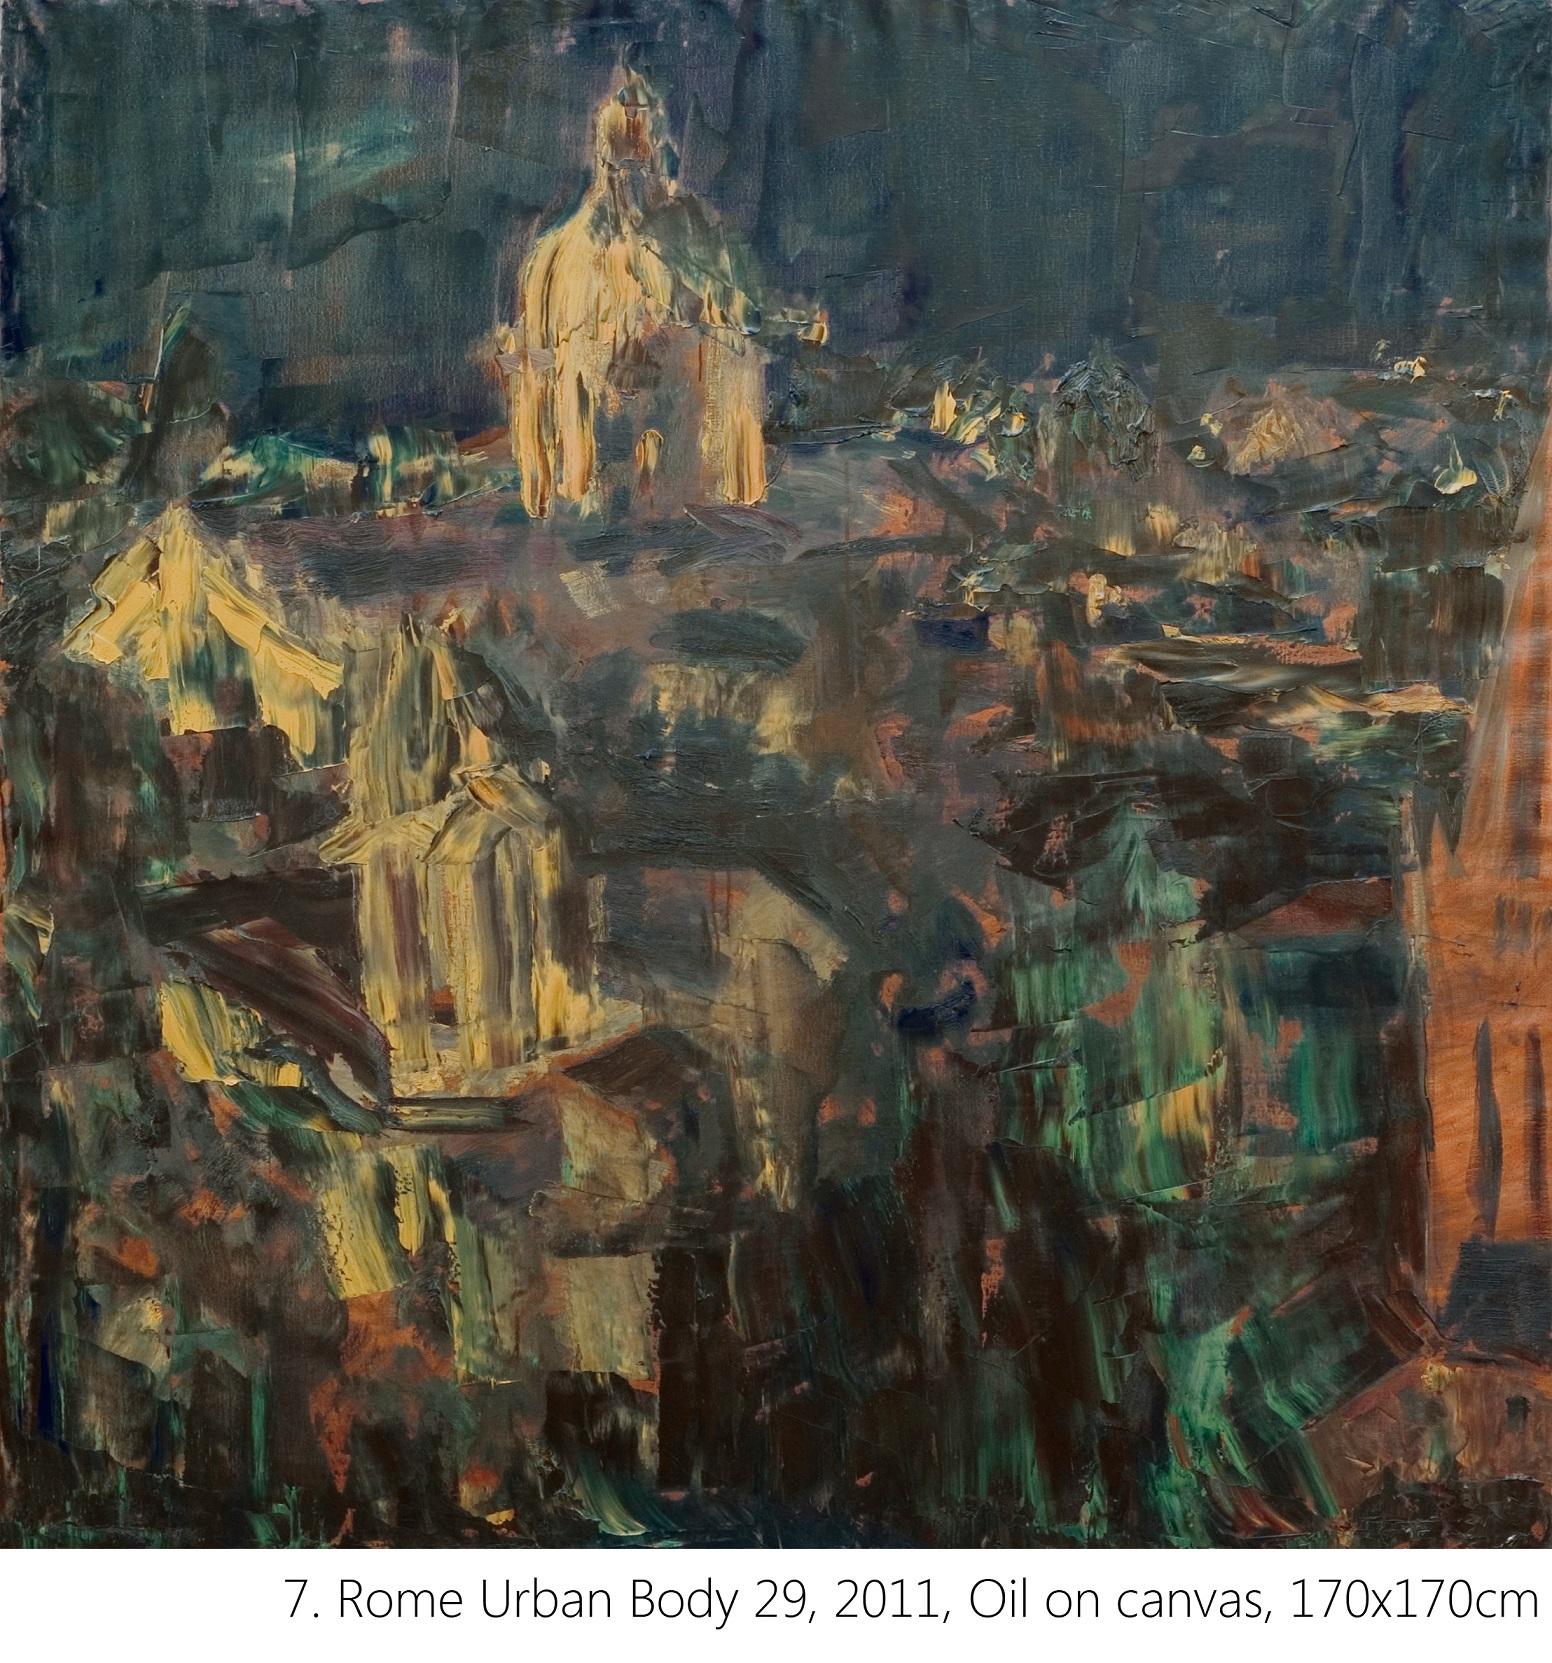 7. Rome Urban Body 29, 2011, Oil on canvas, 170x170cm